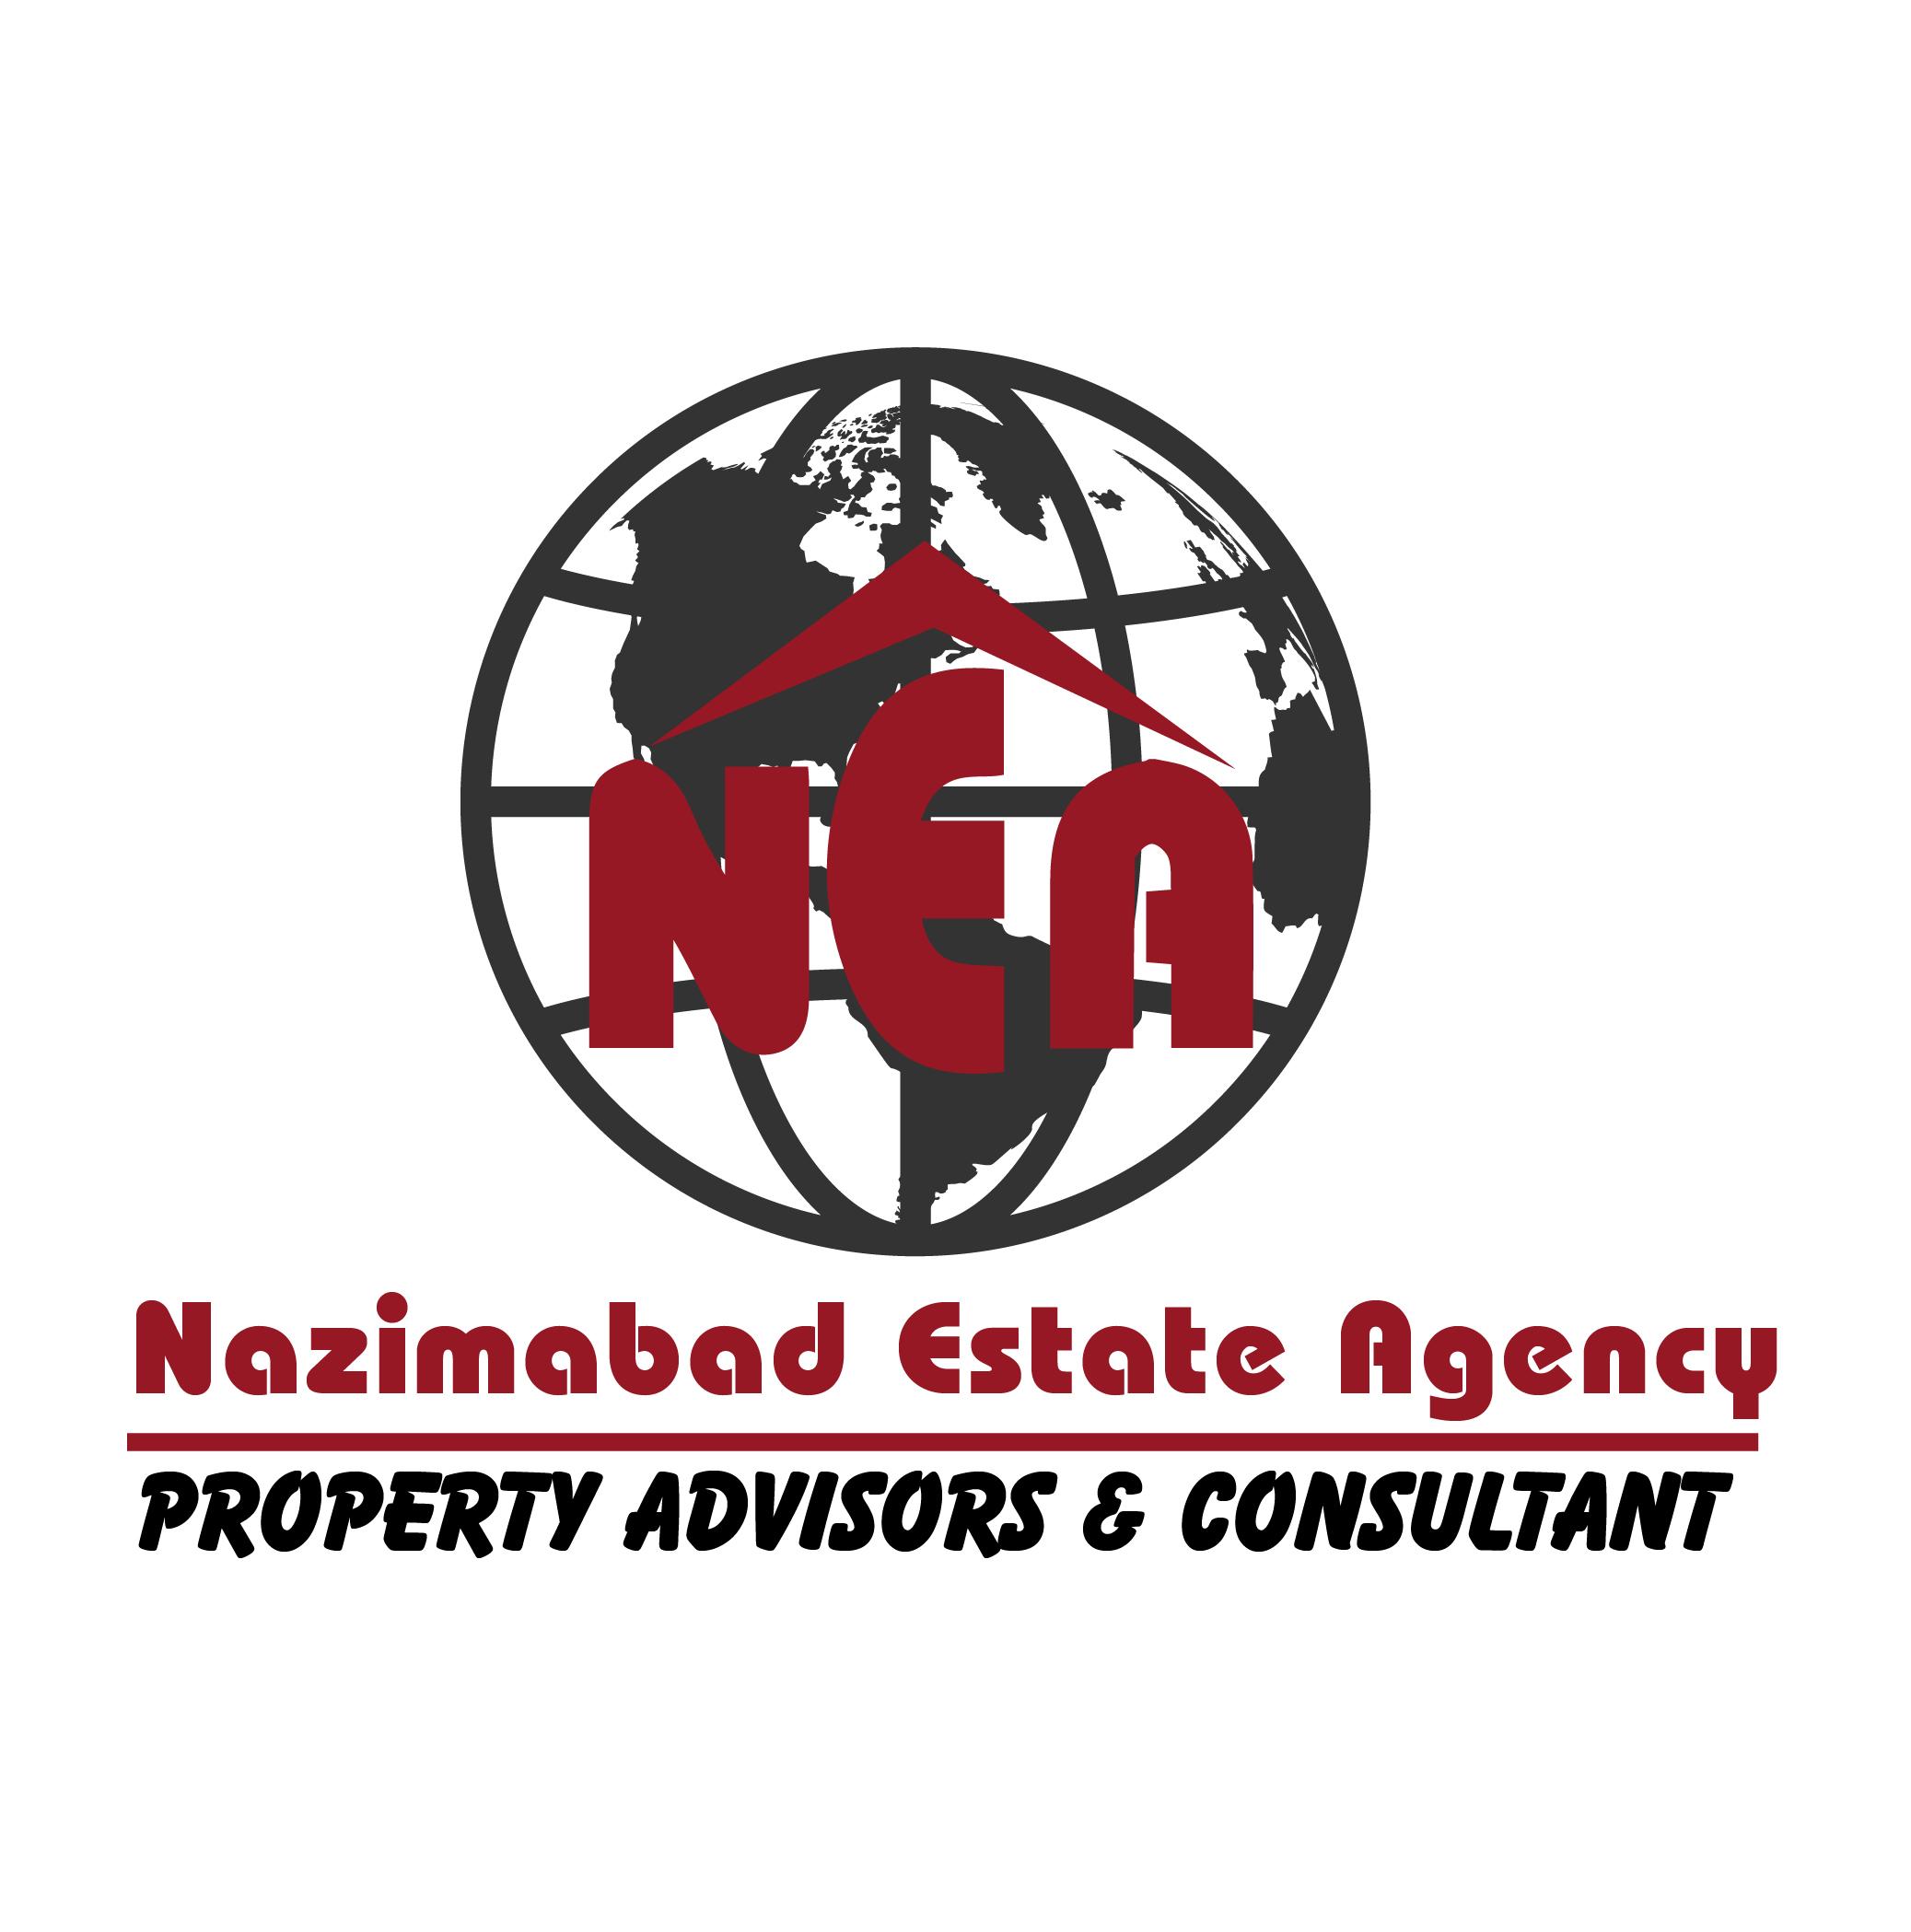 Nazimabad Estate Agency